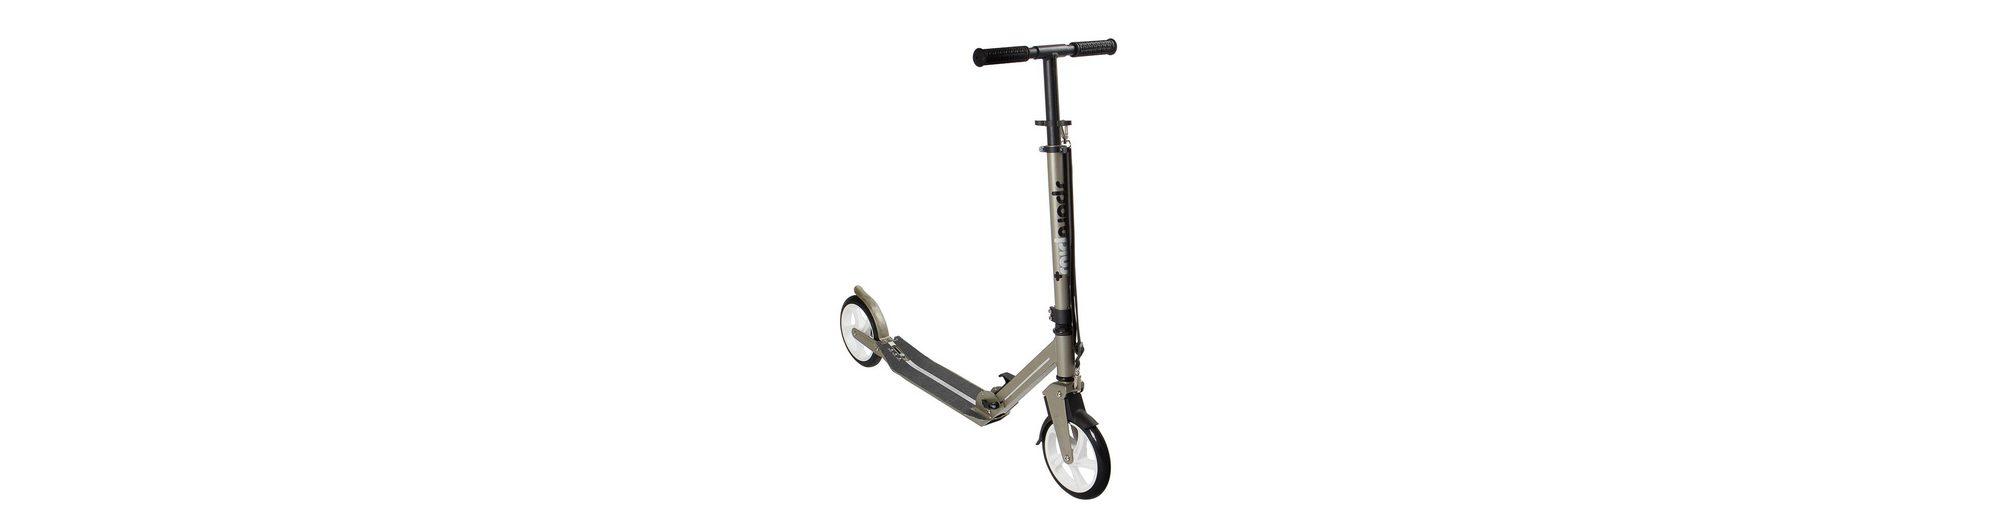 Sportplus EZY! Urban Scooter, »Titan SP-SC-102«